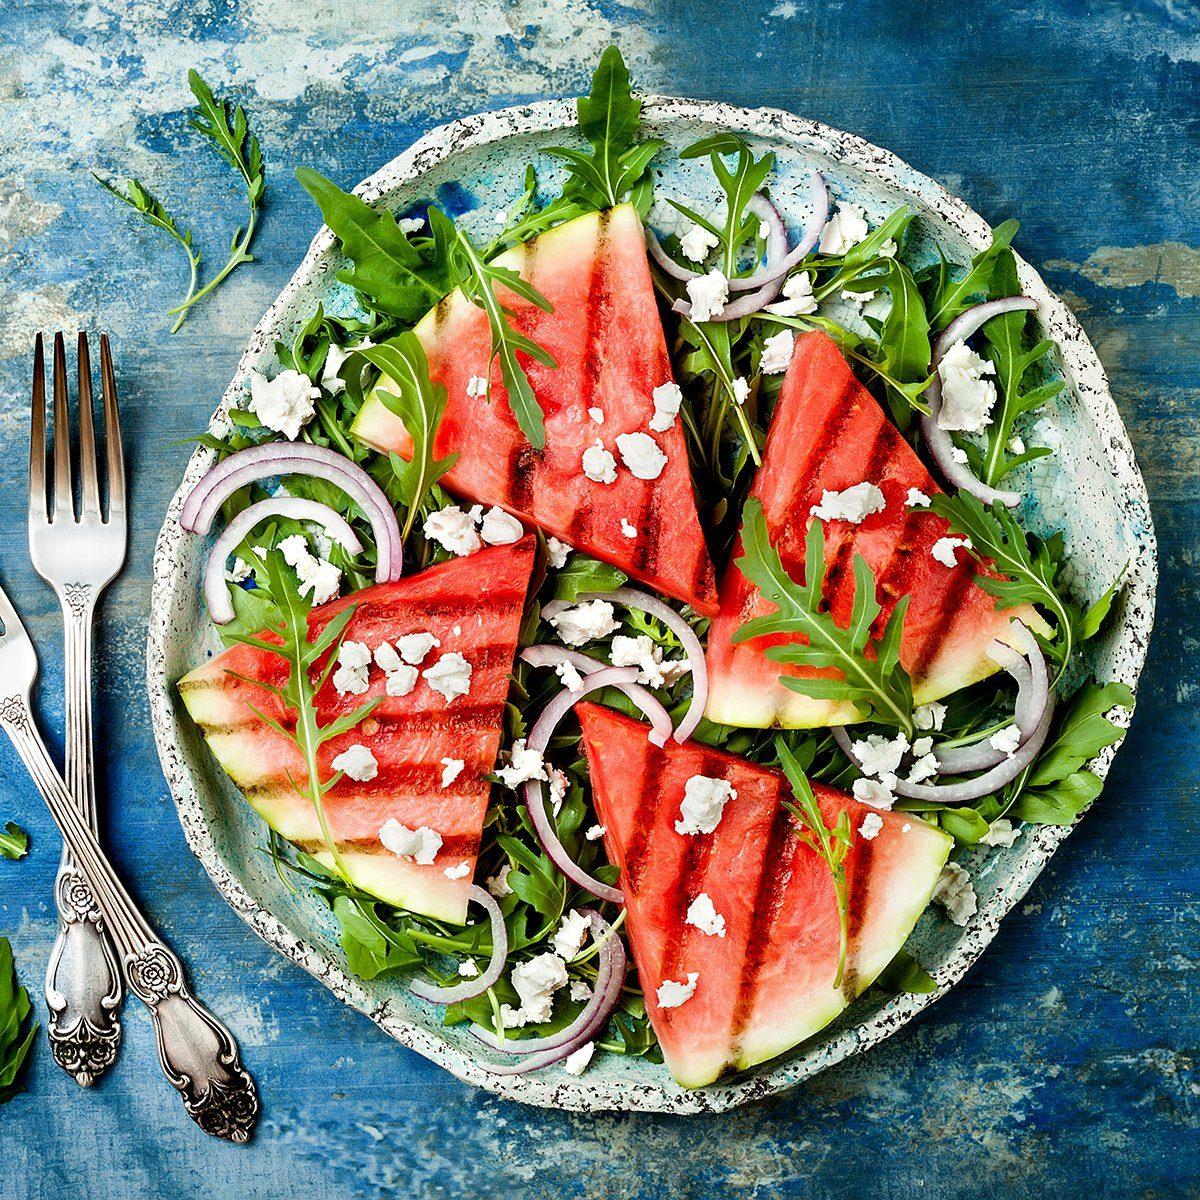 Fresh summer grilled watermelon salad with feta cheese, arugula, onions on blue background